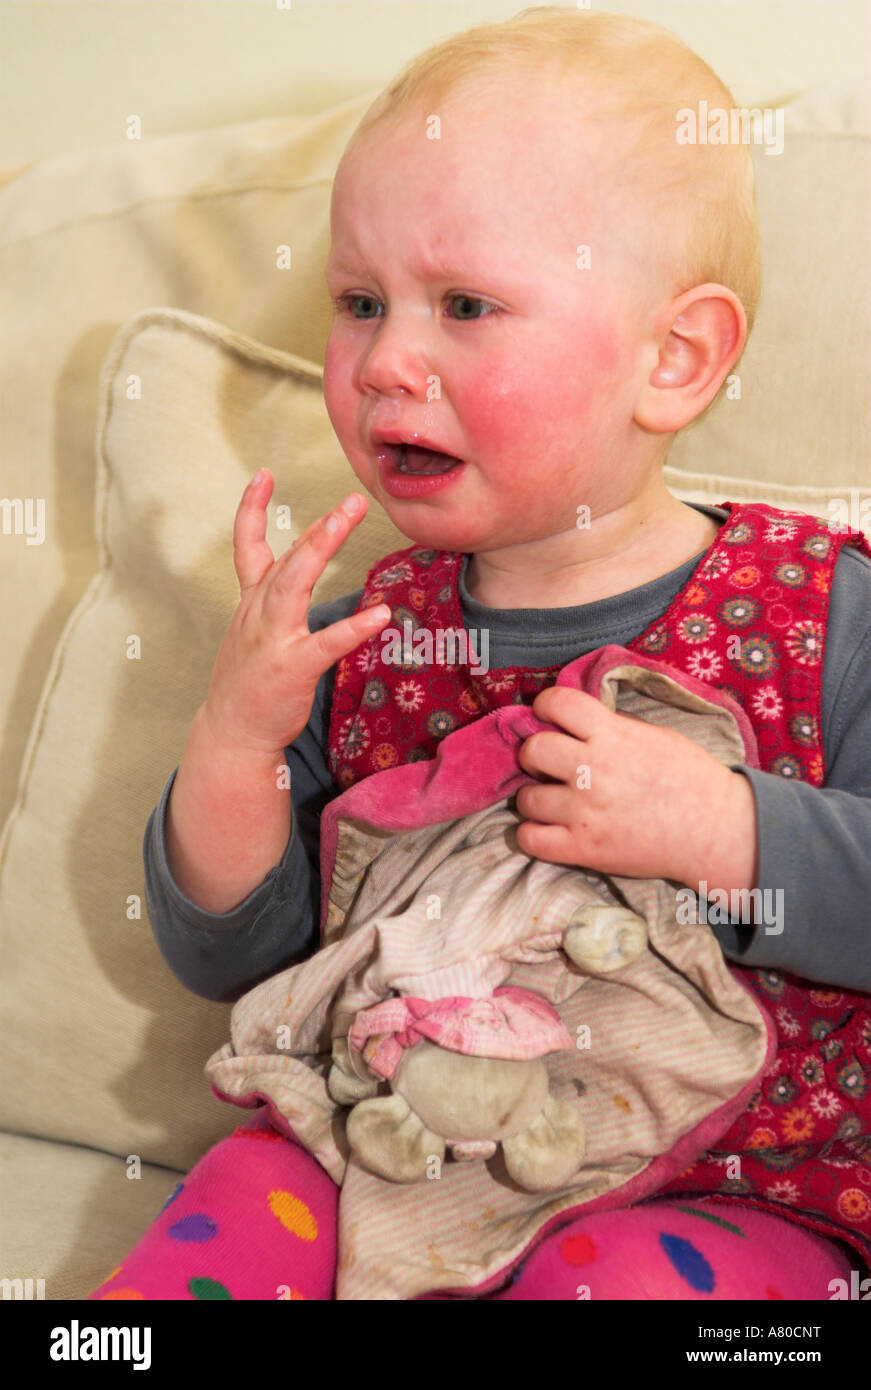 Young little girl on sofa crying - Stock Image